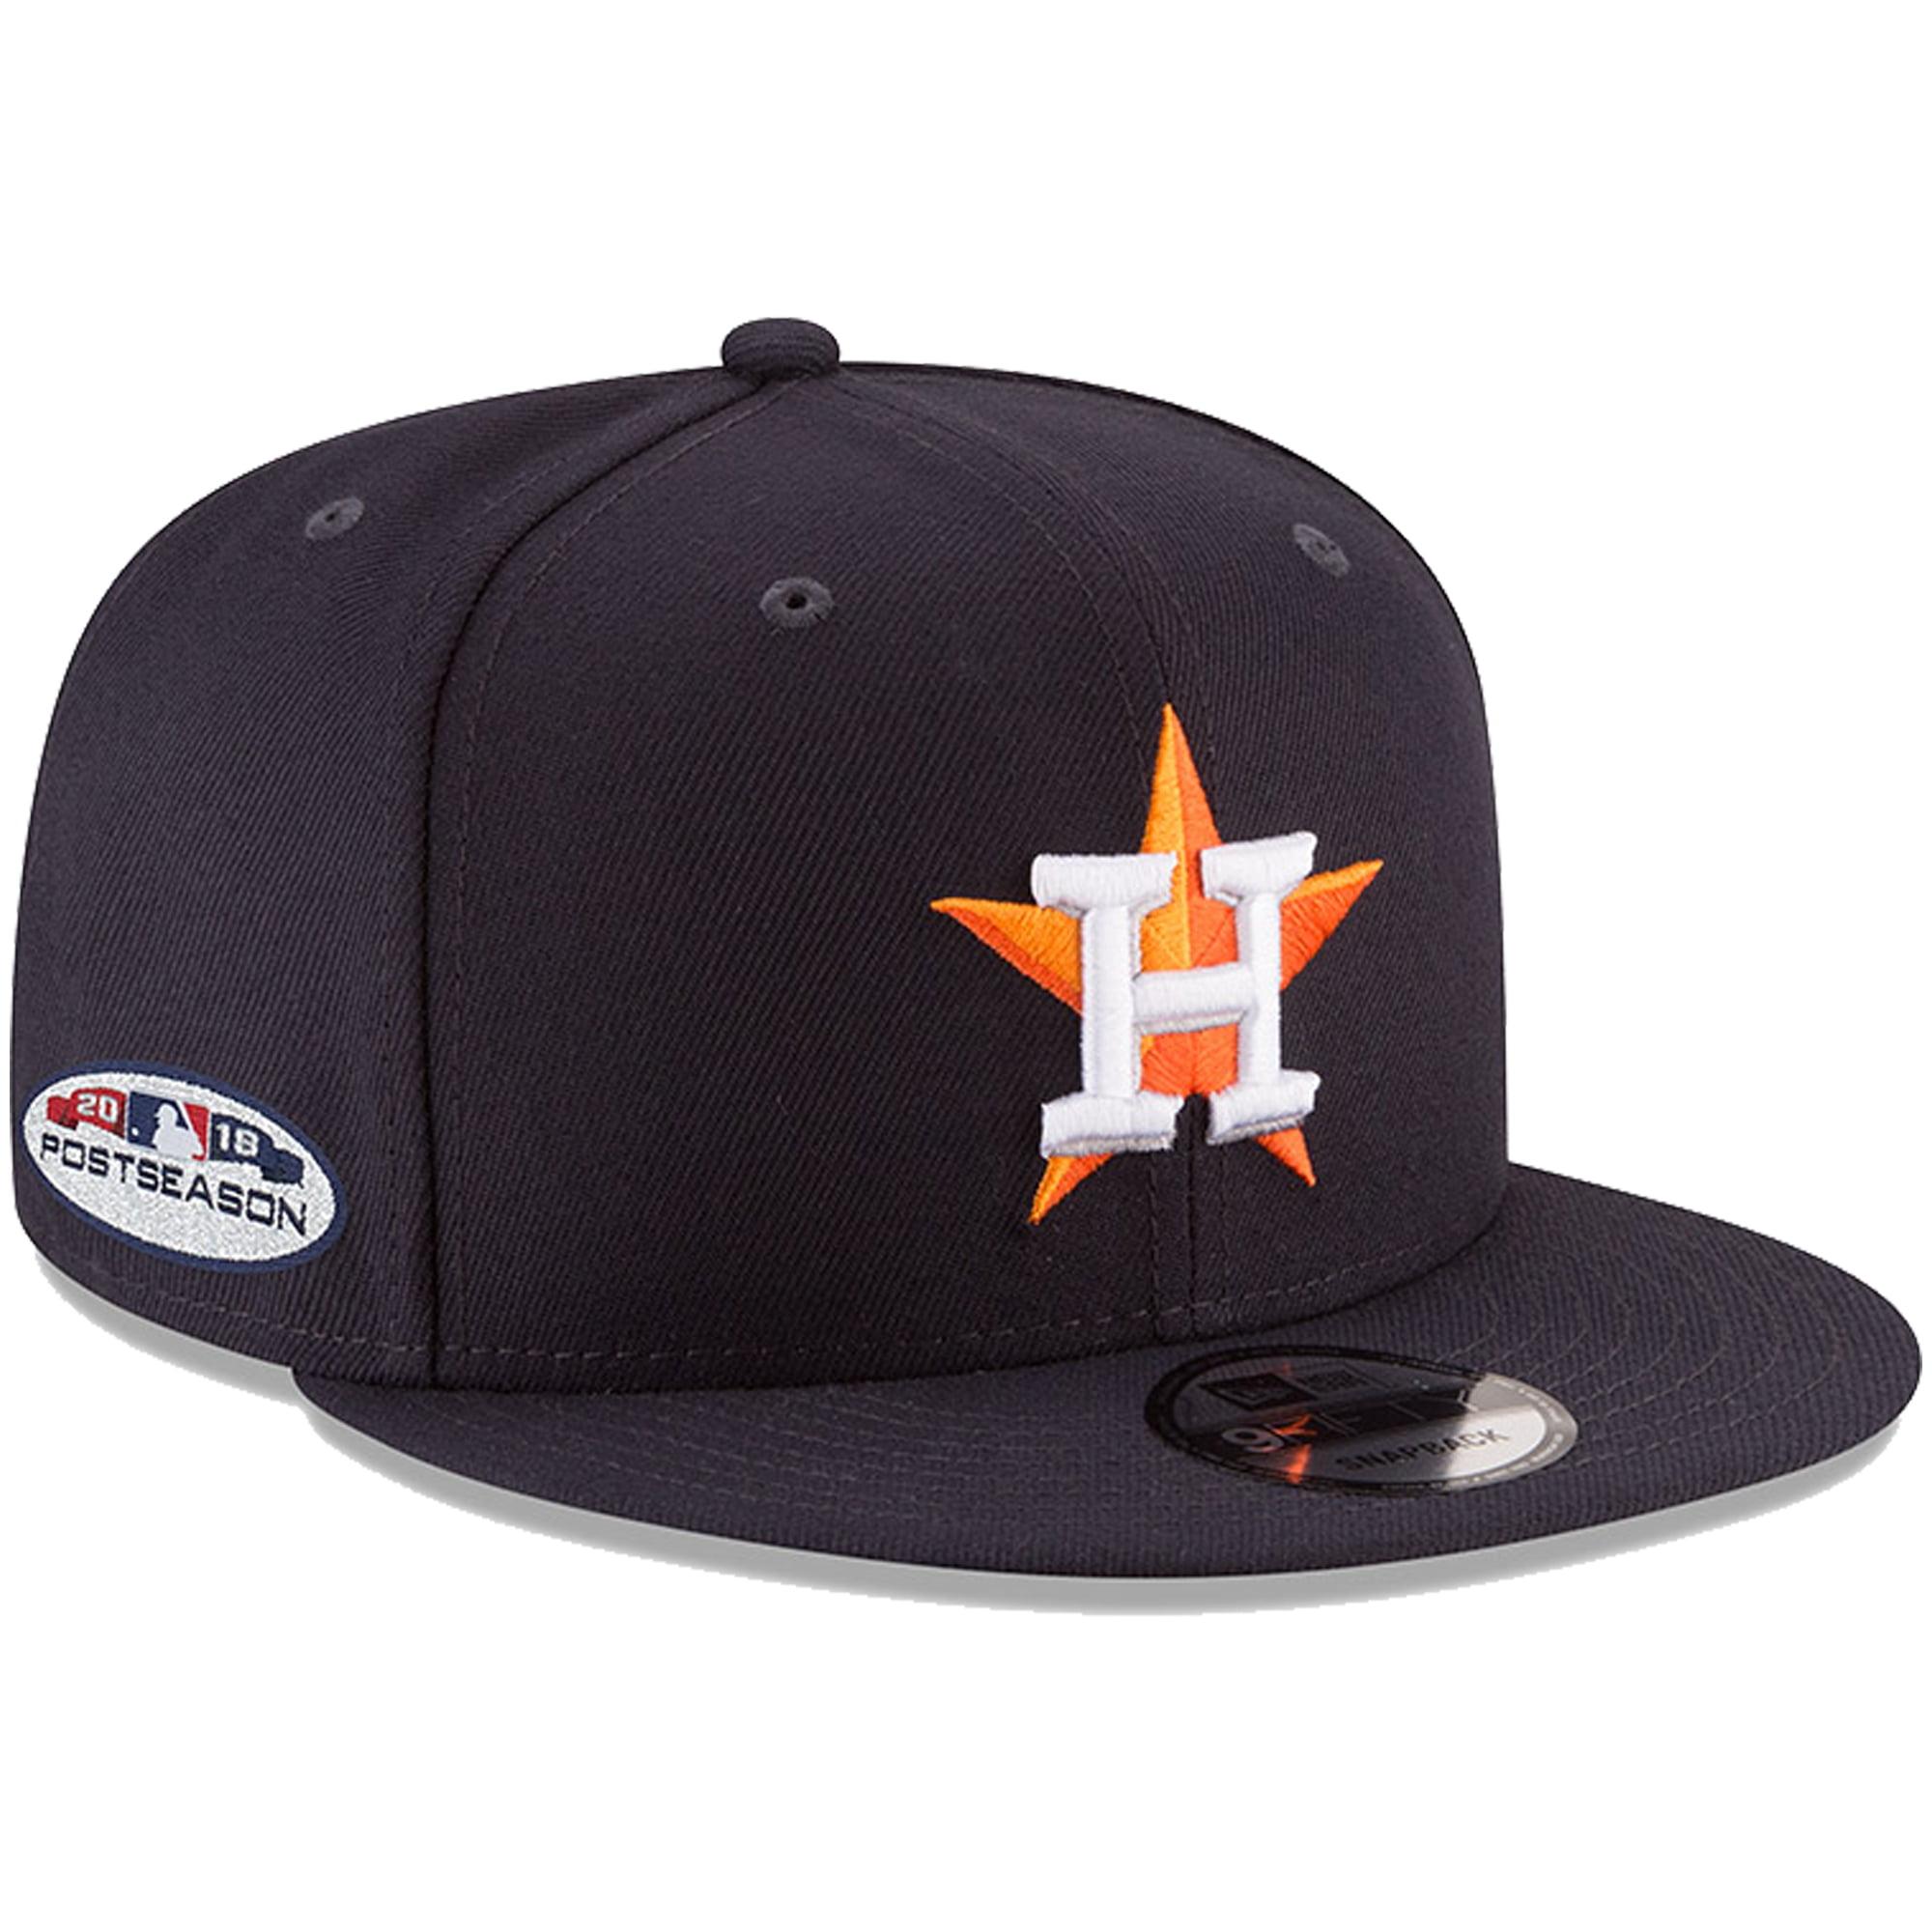 Houston Astros New Era 2018 Postseason Side Patch 9FIFTY Adjustable Hat - Navy - OSFA